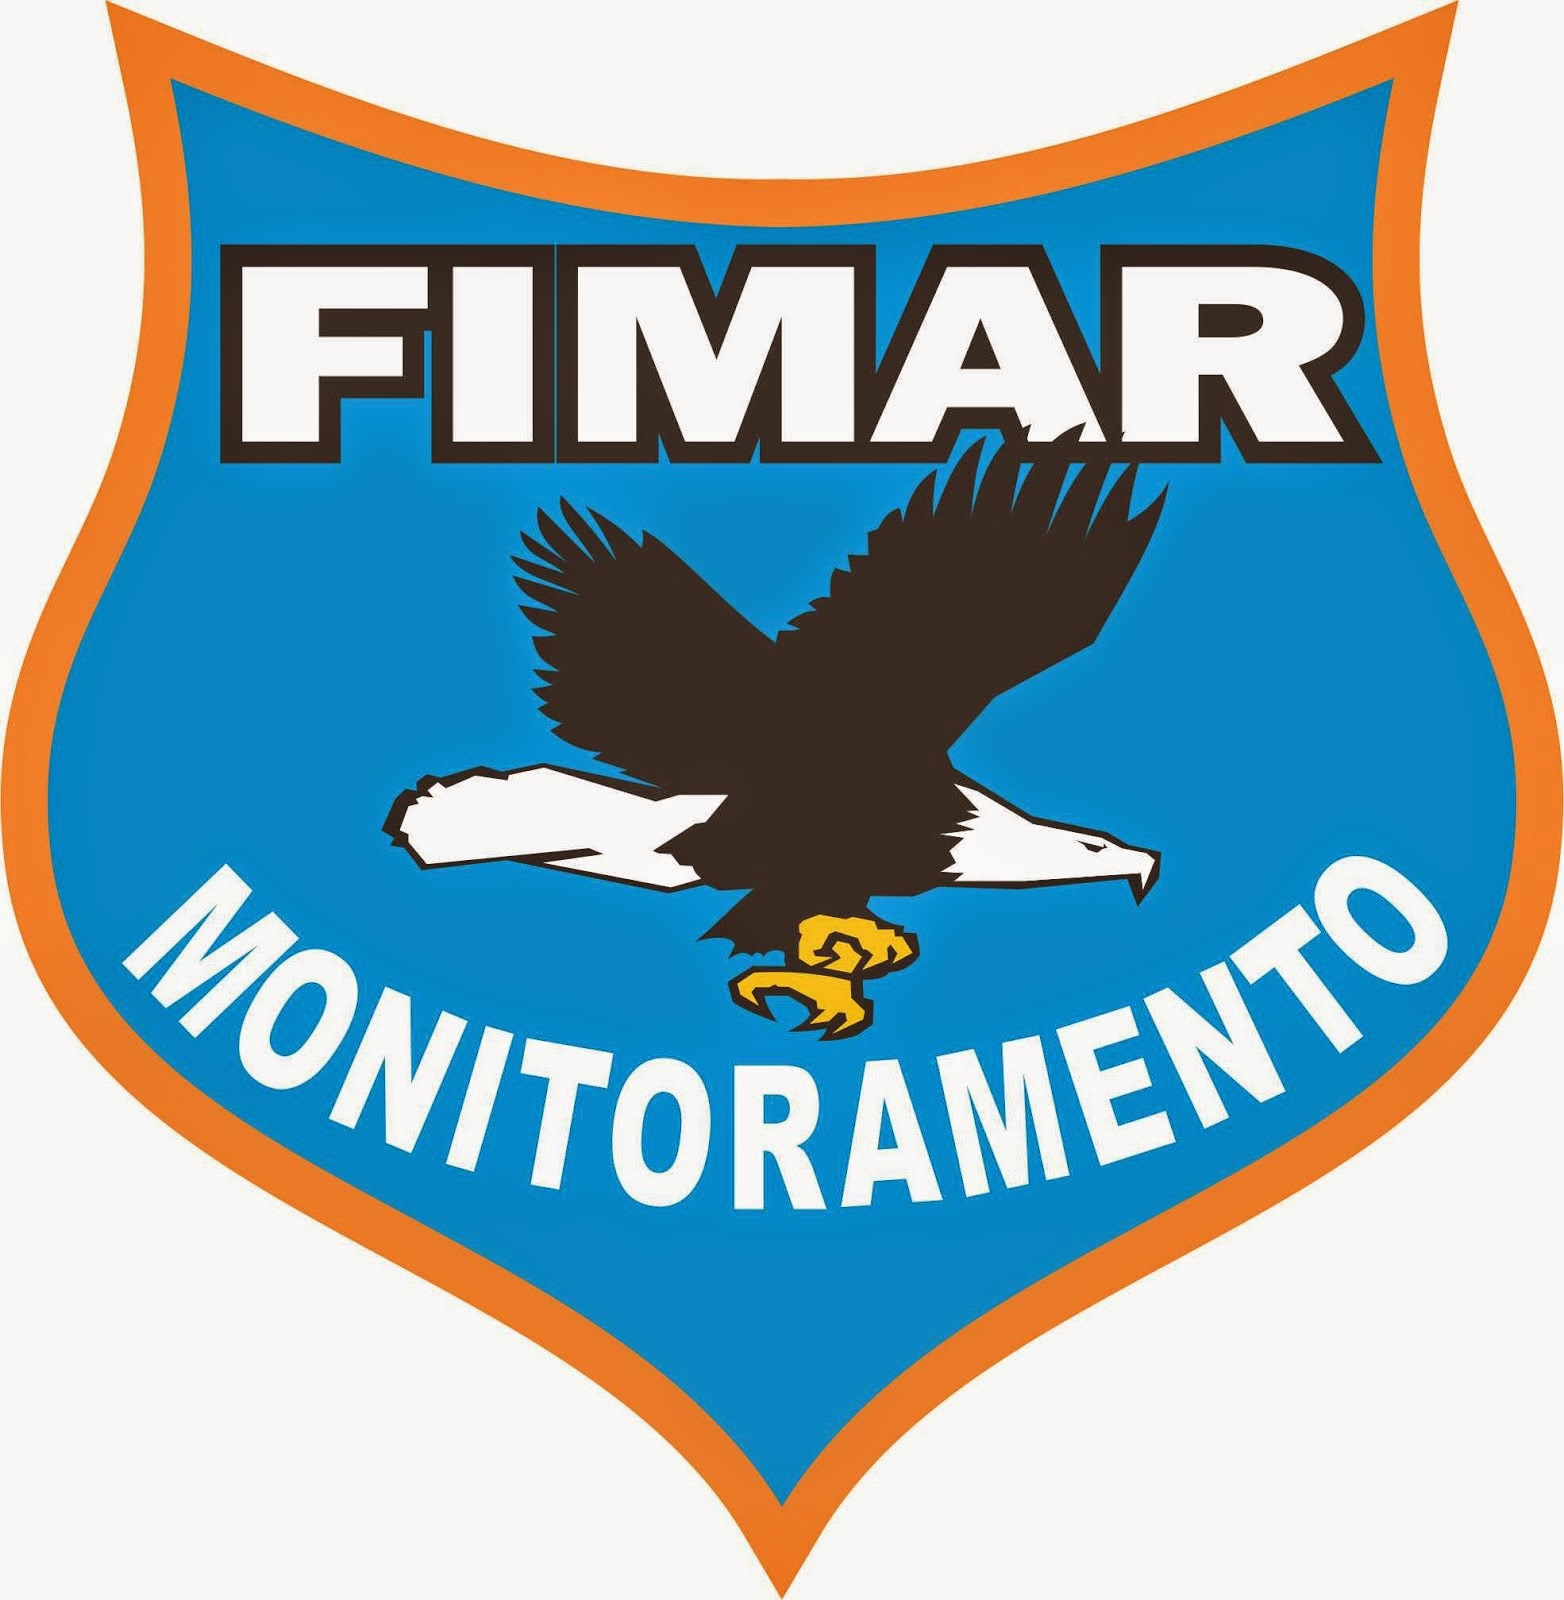 FIMAR MONITORAMENTO